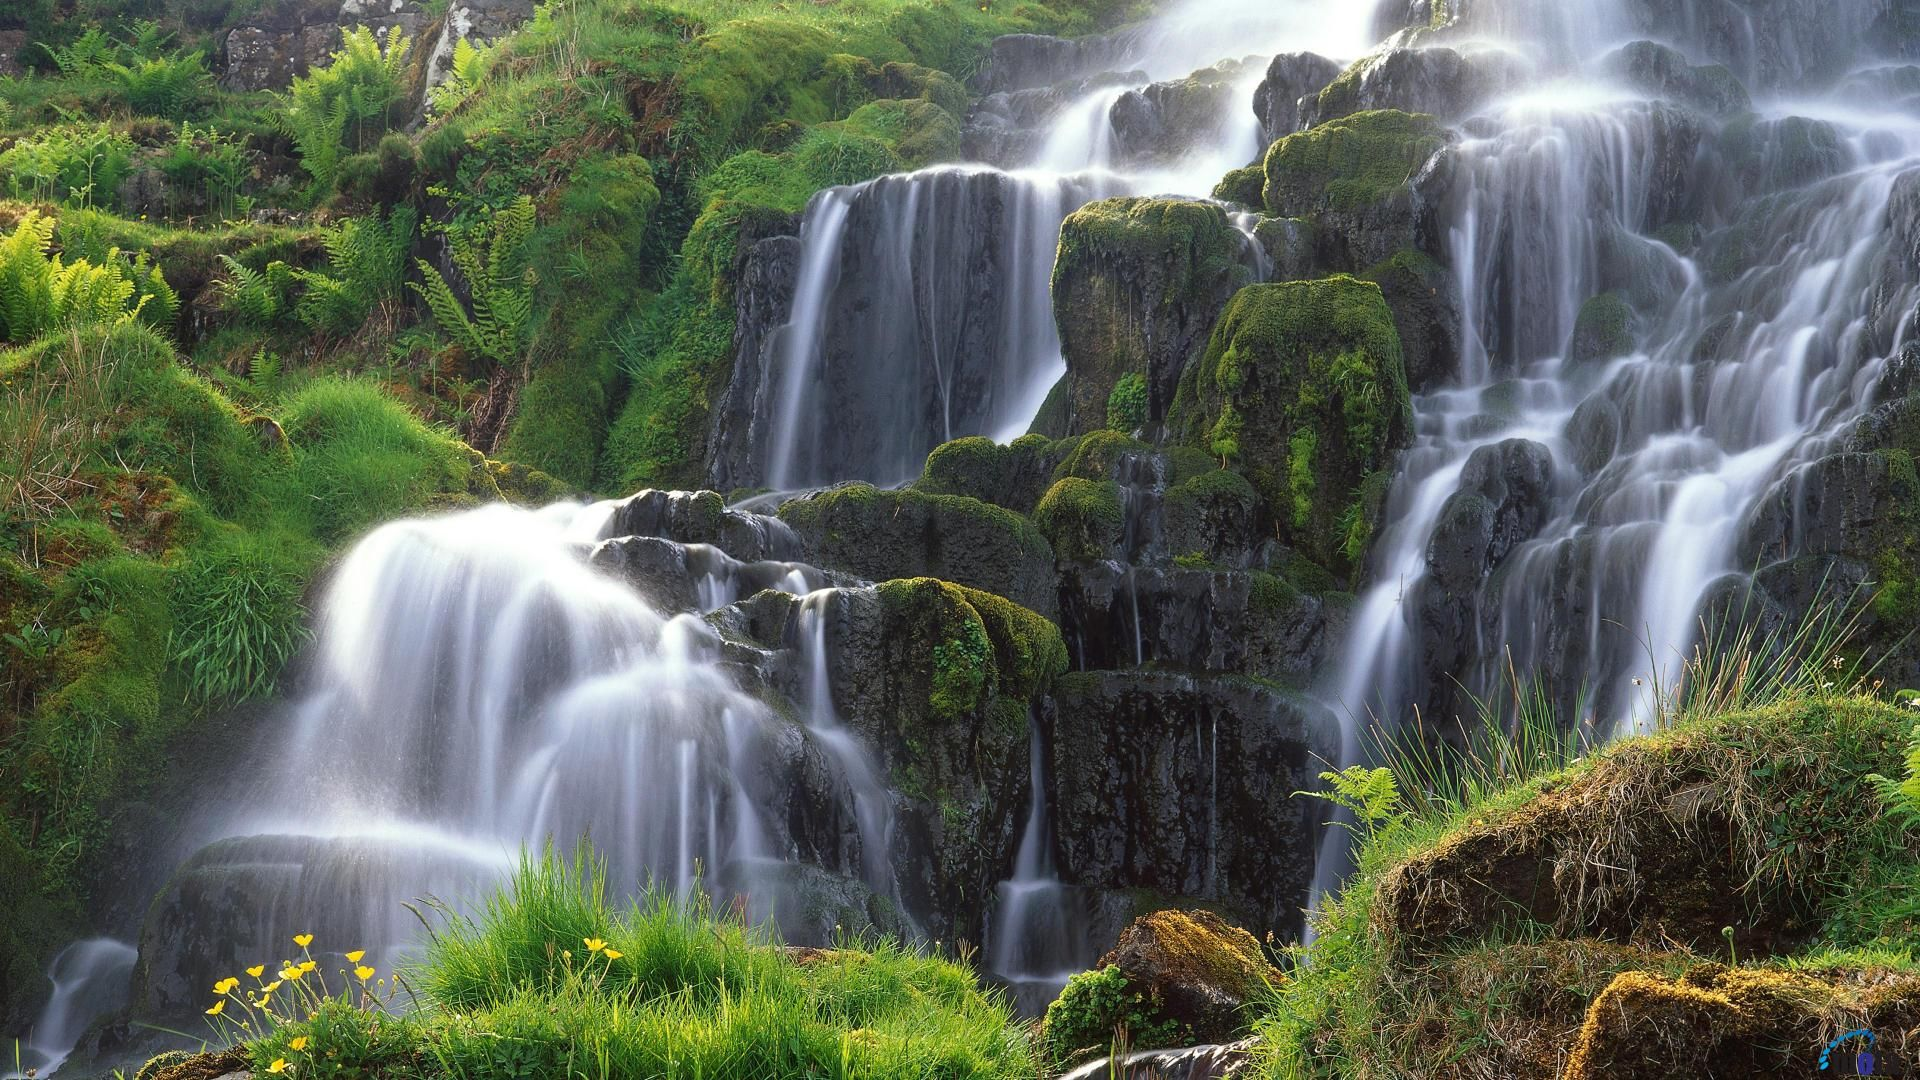 Waterfalls Wallpapers 1080p: Hd Images Of Waterfalls